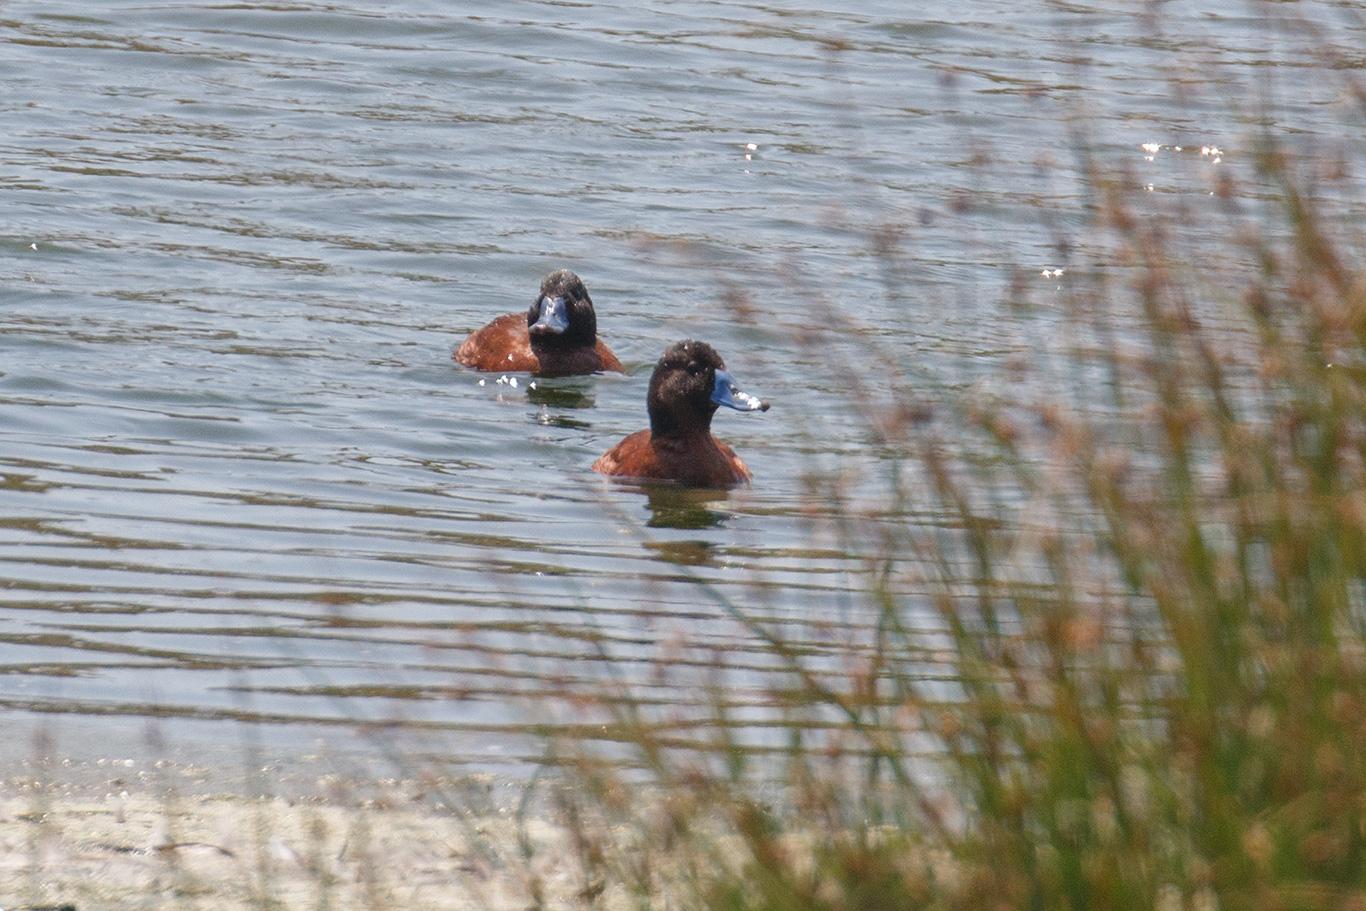 Lake Duck, Humedal De Cartagena, Chile.